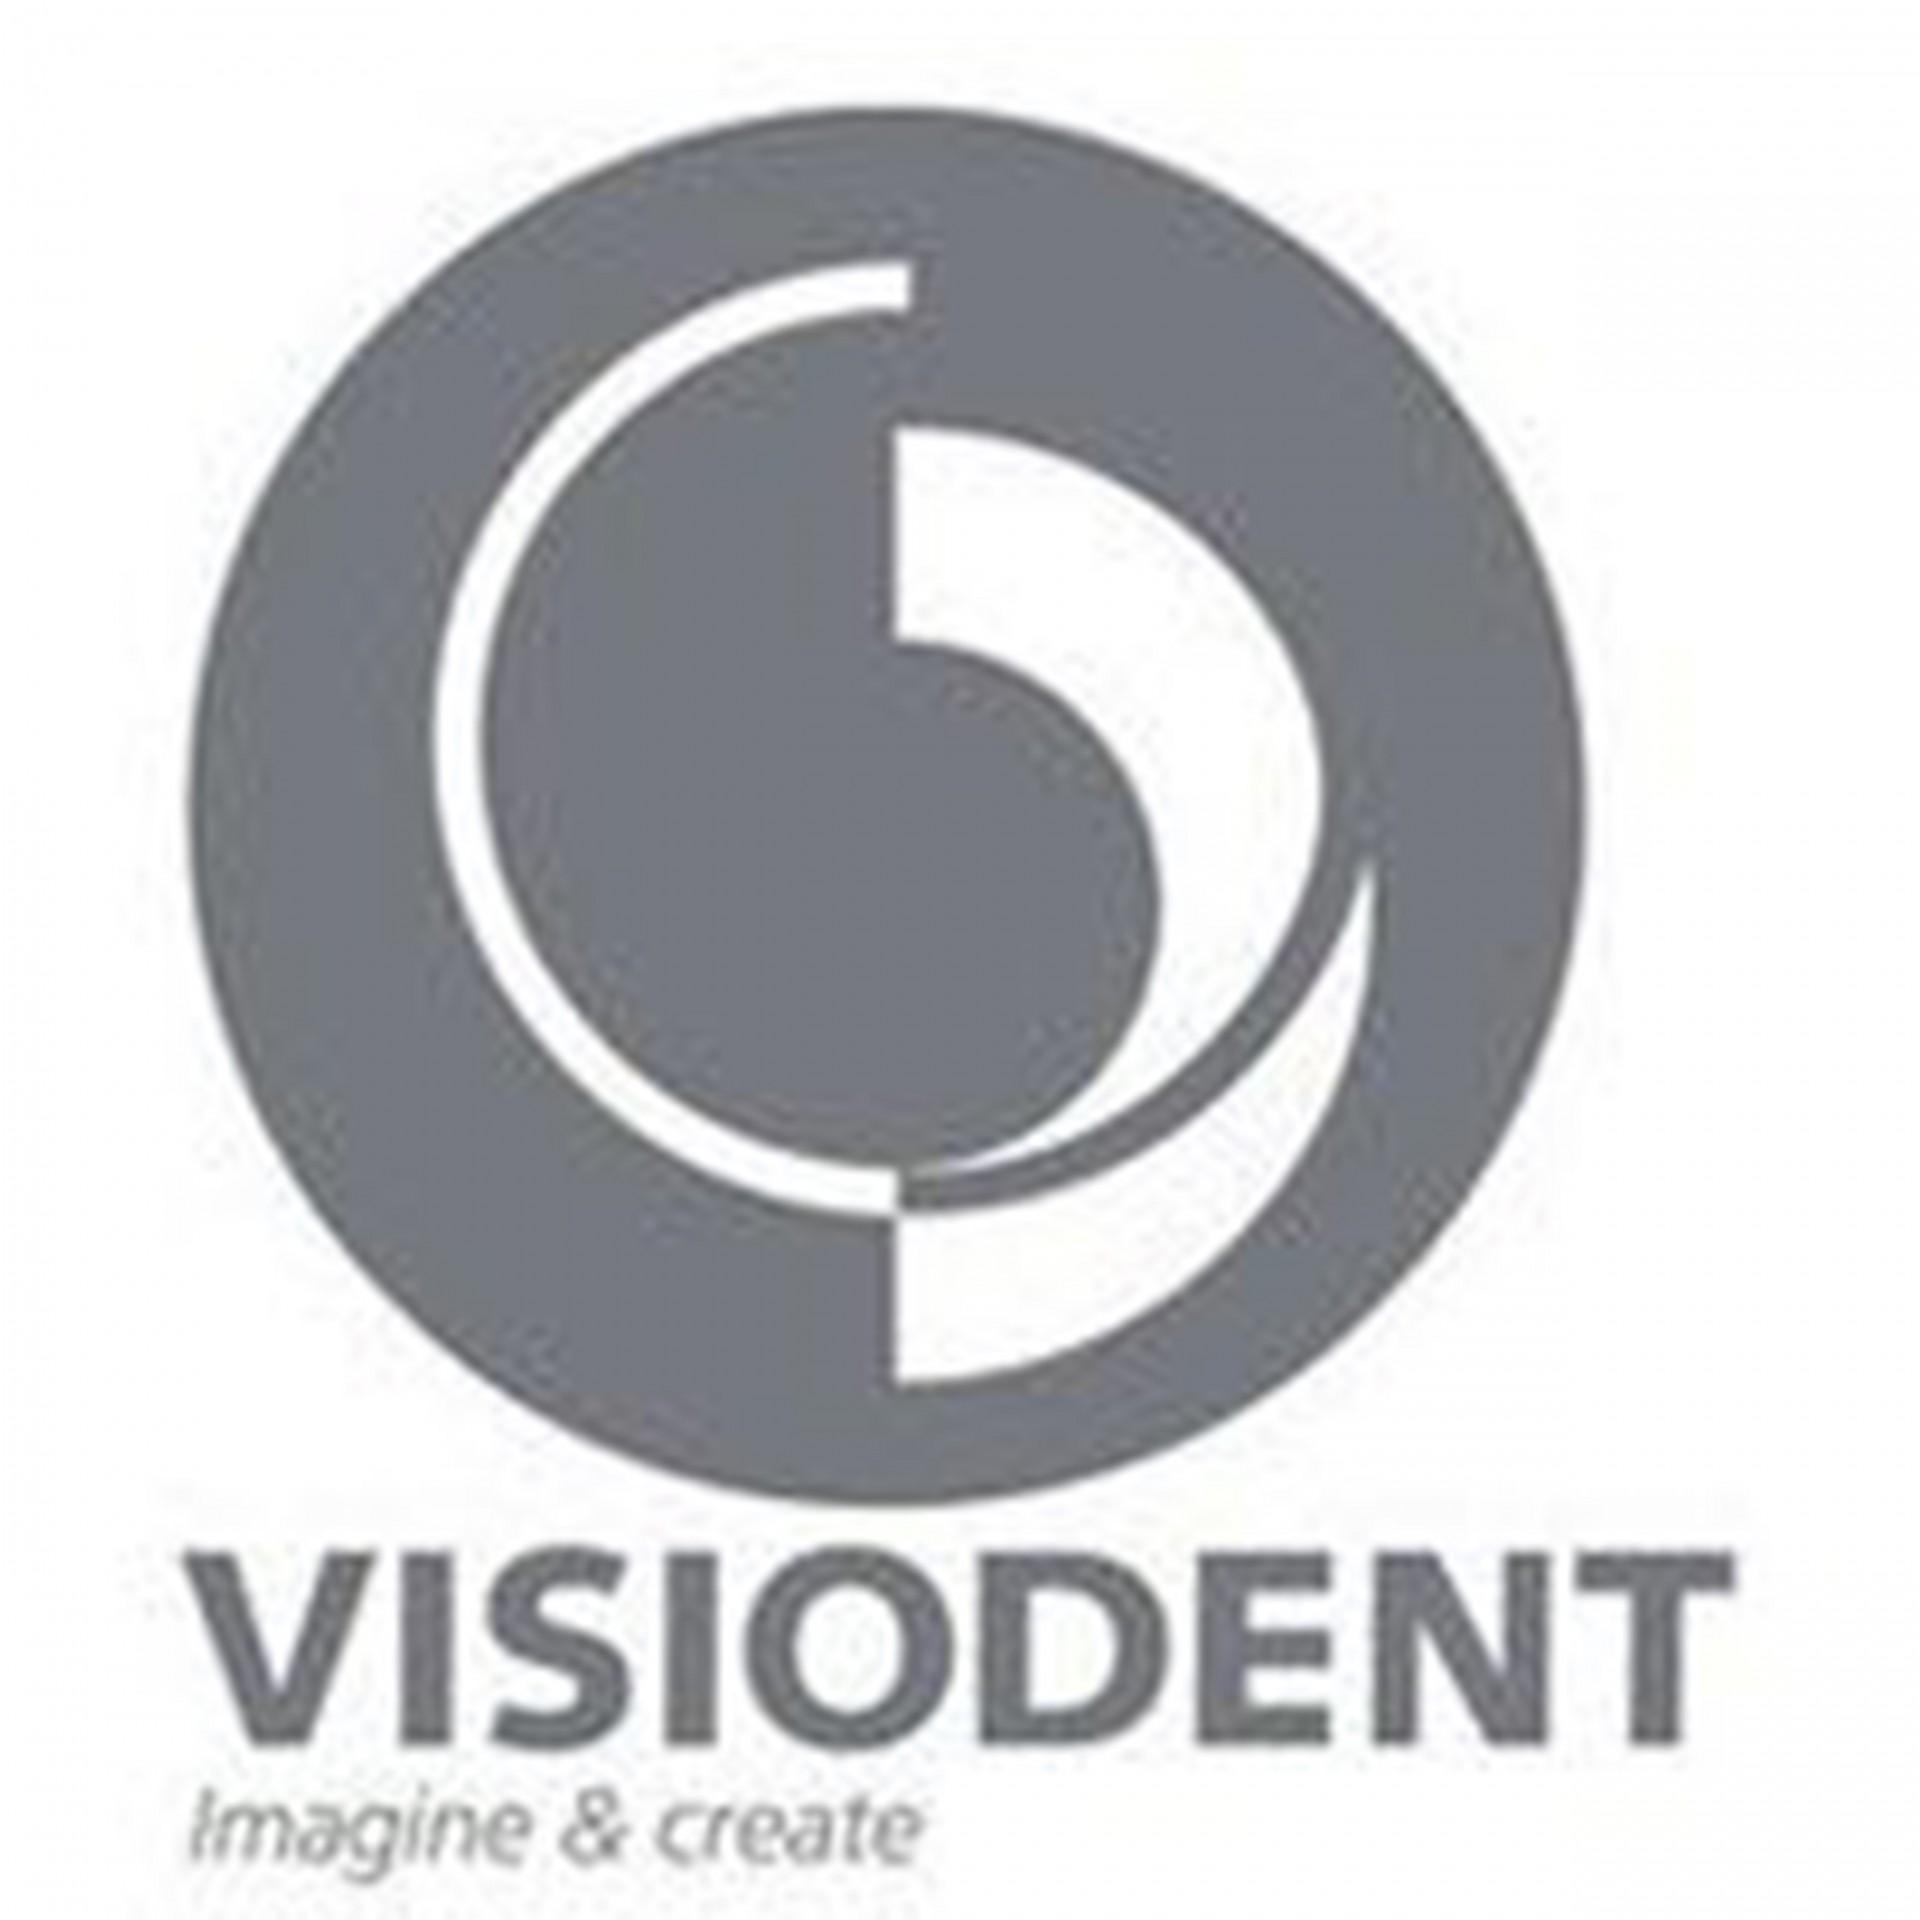 RSV5 VISIODENT